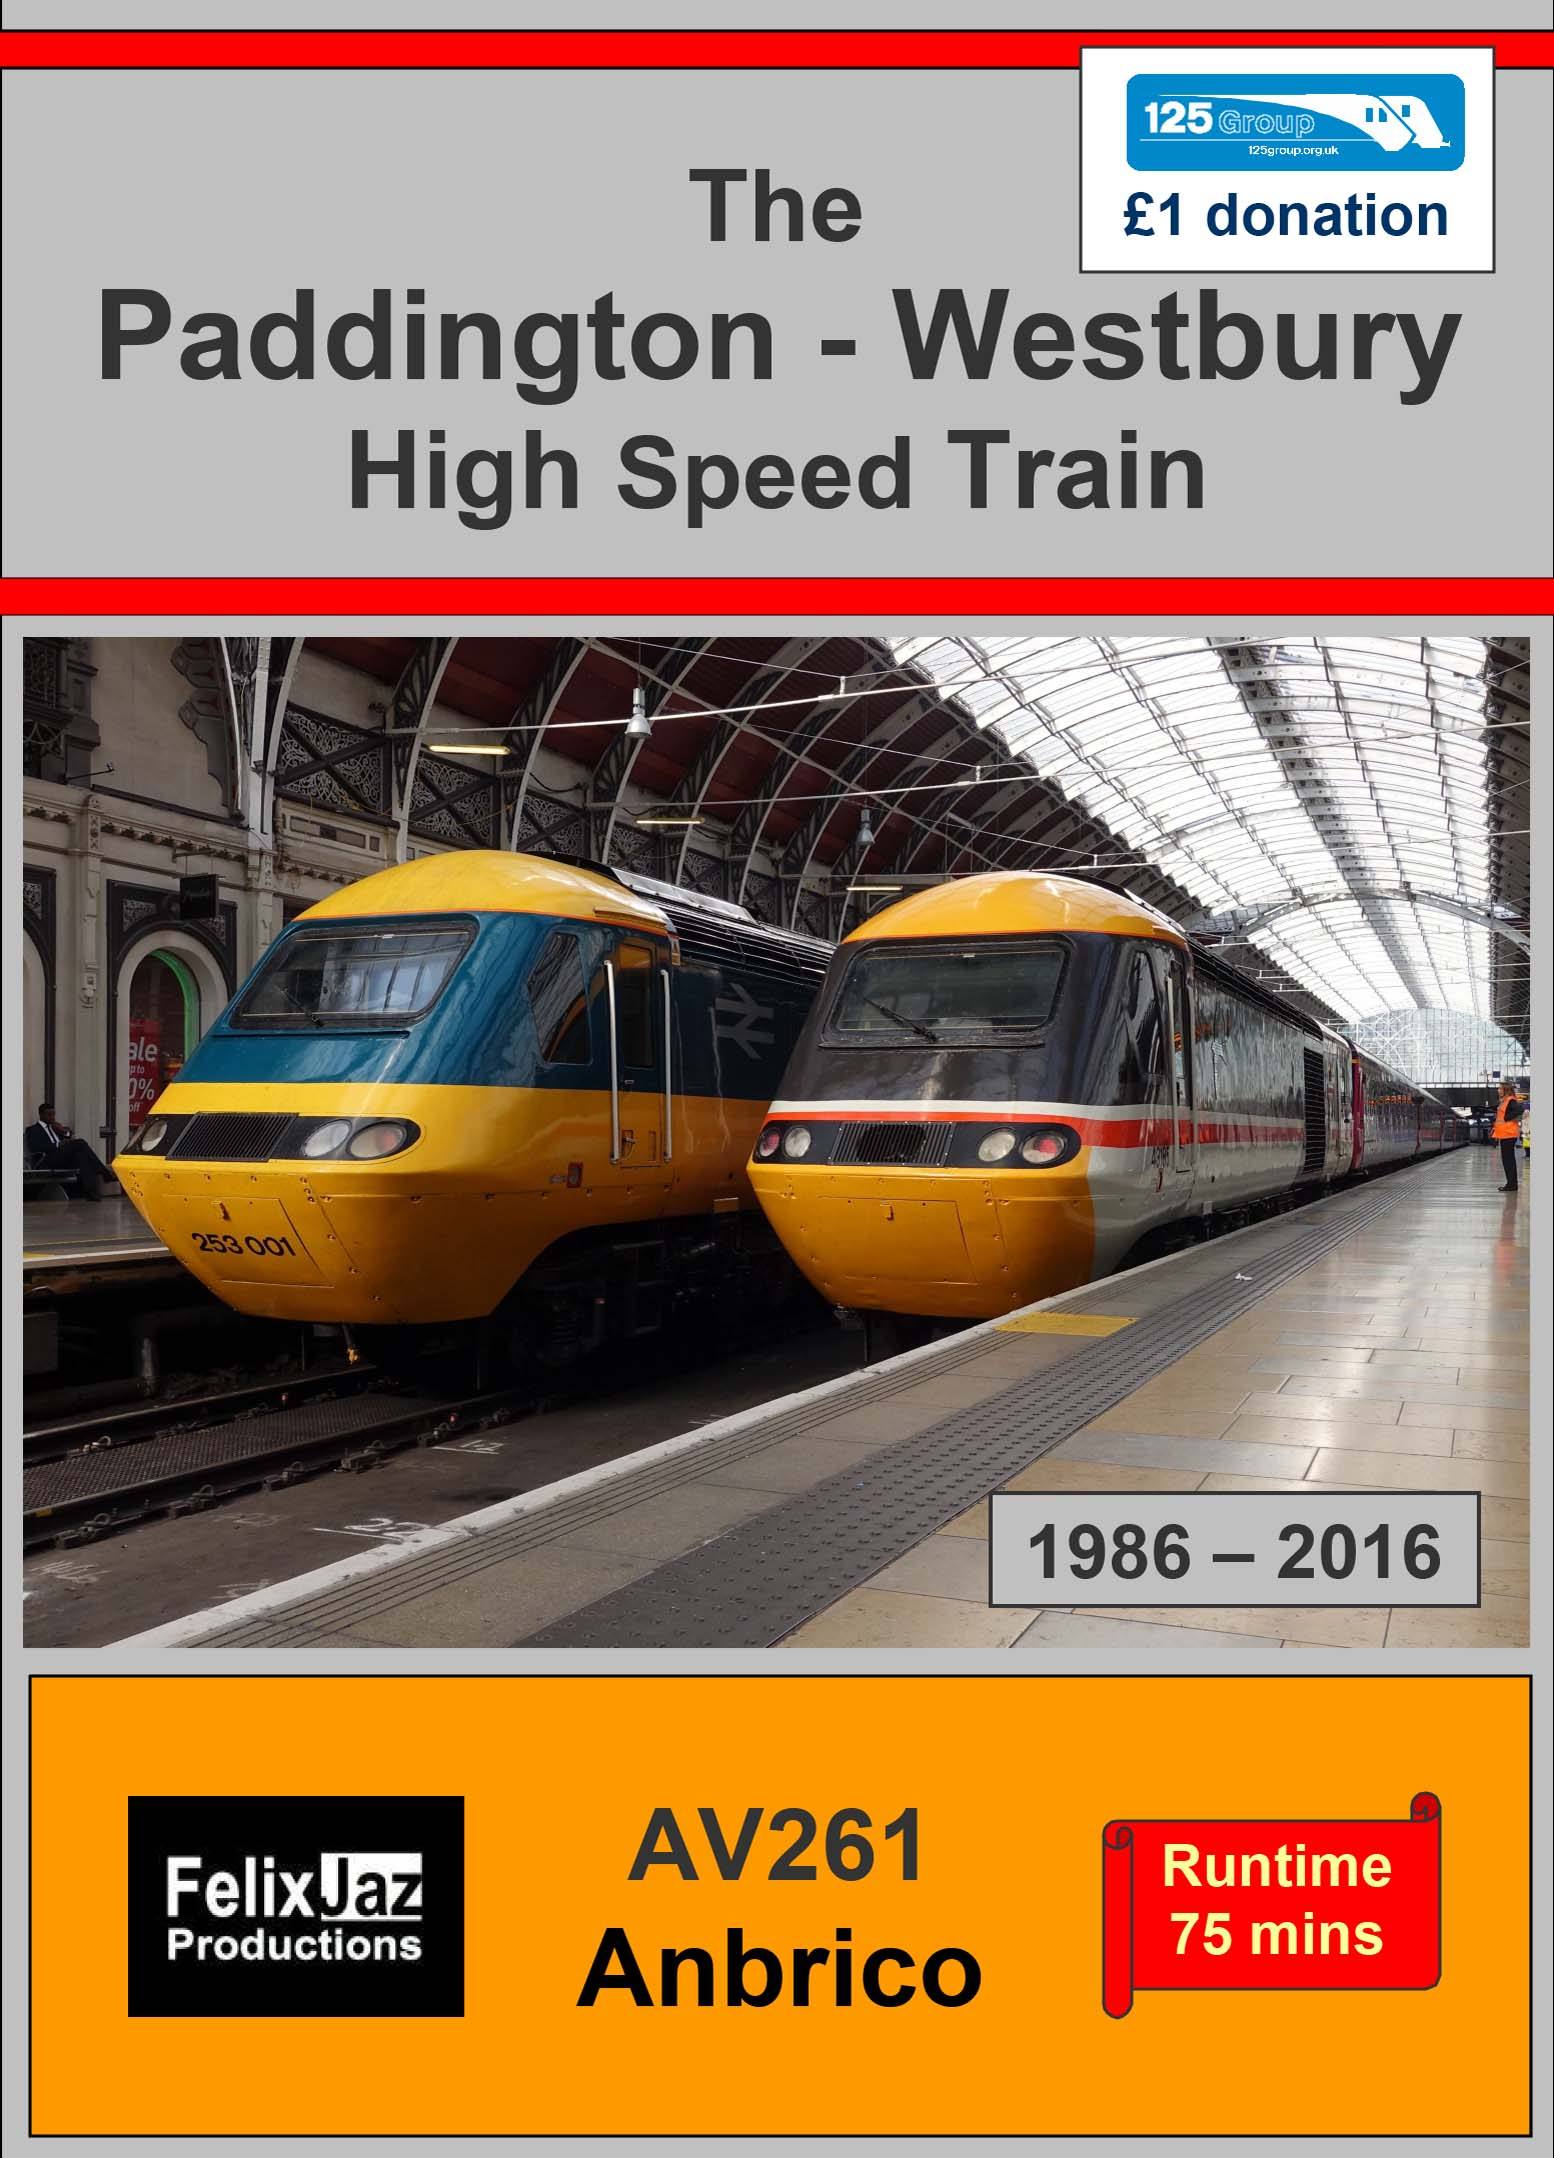 AV261 The Paddington – Westbury High Speed Train